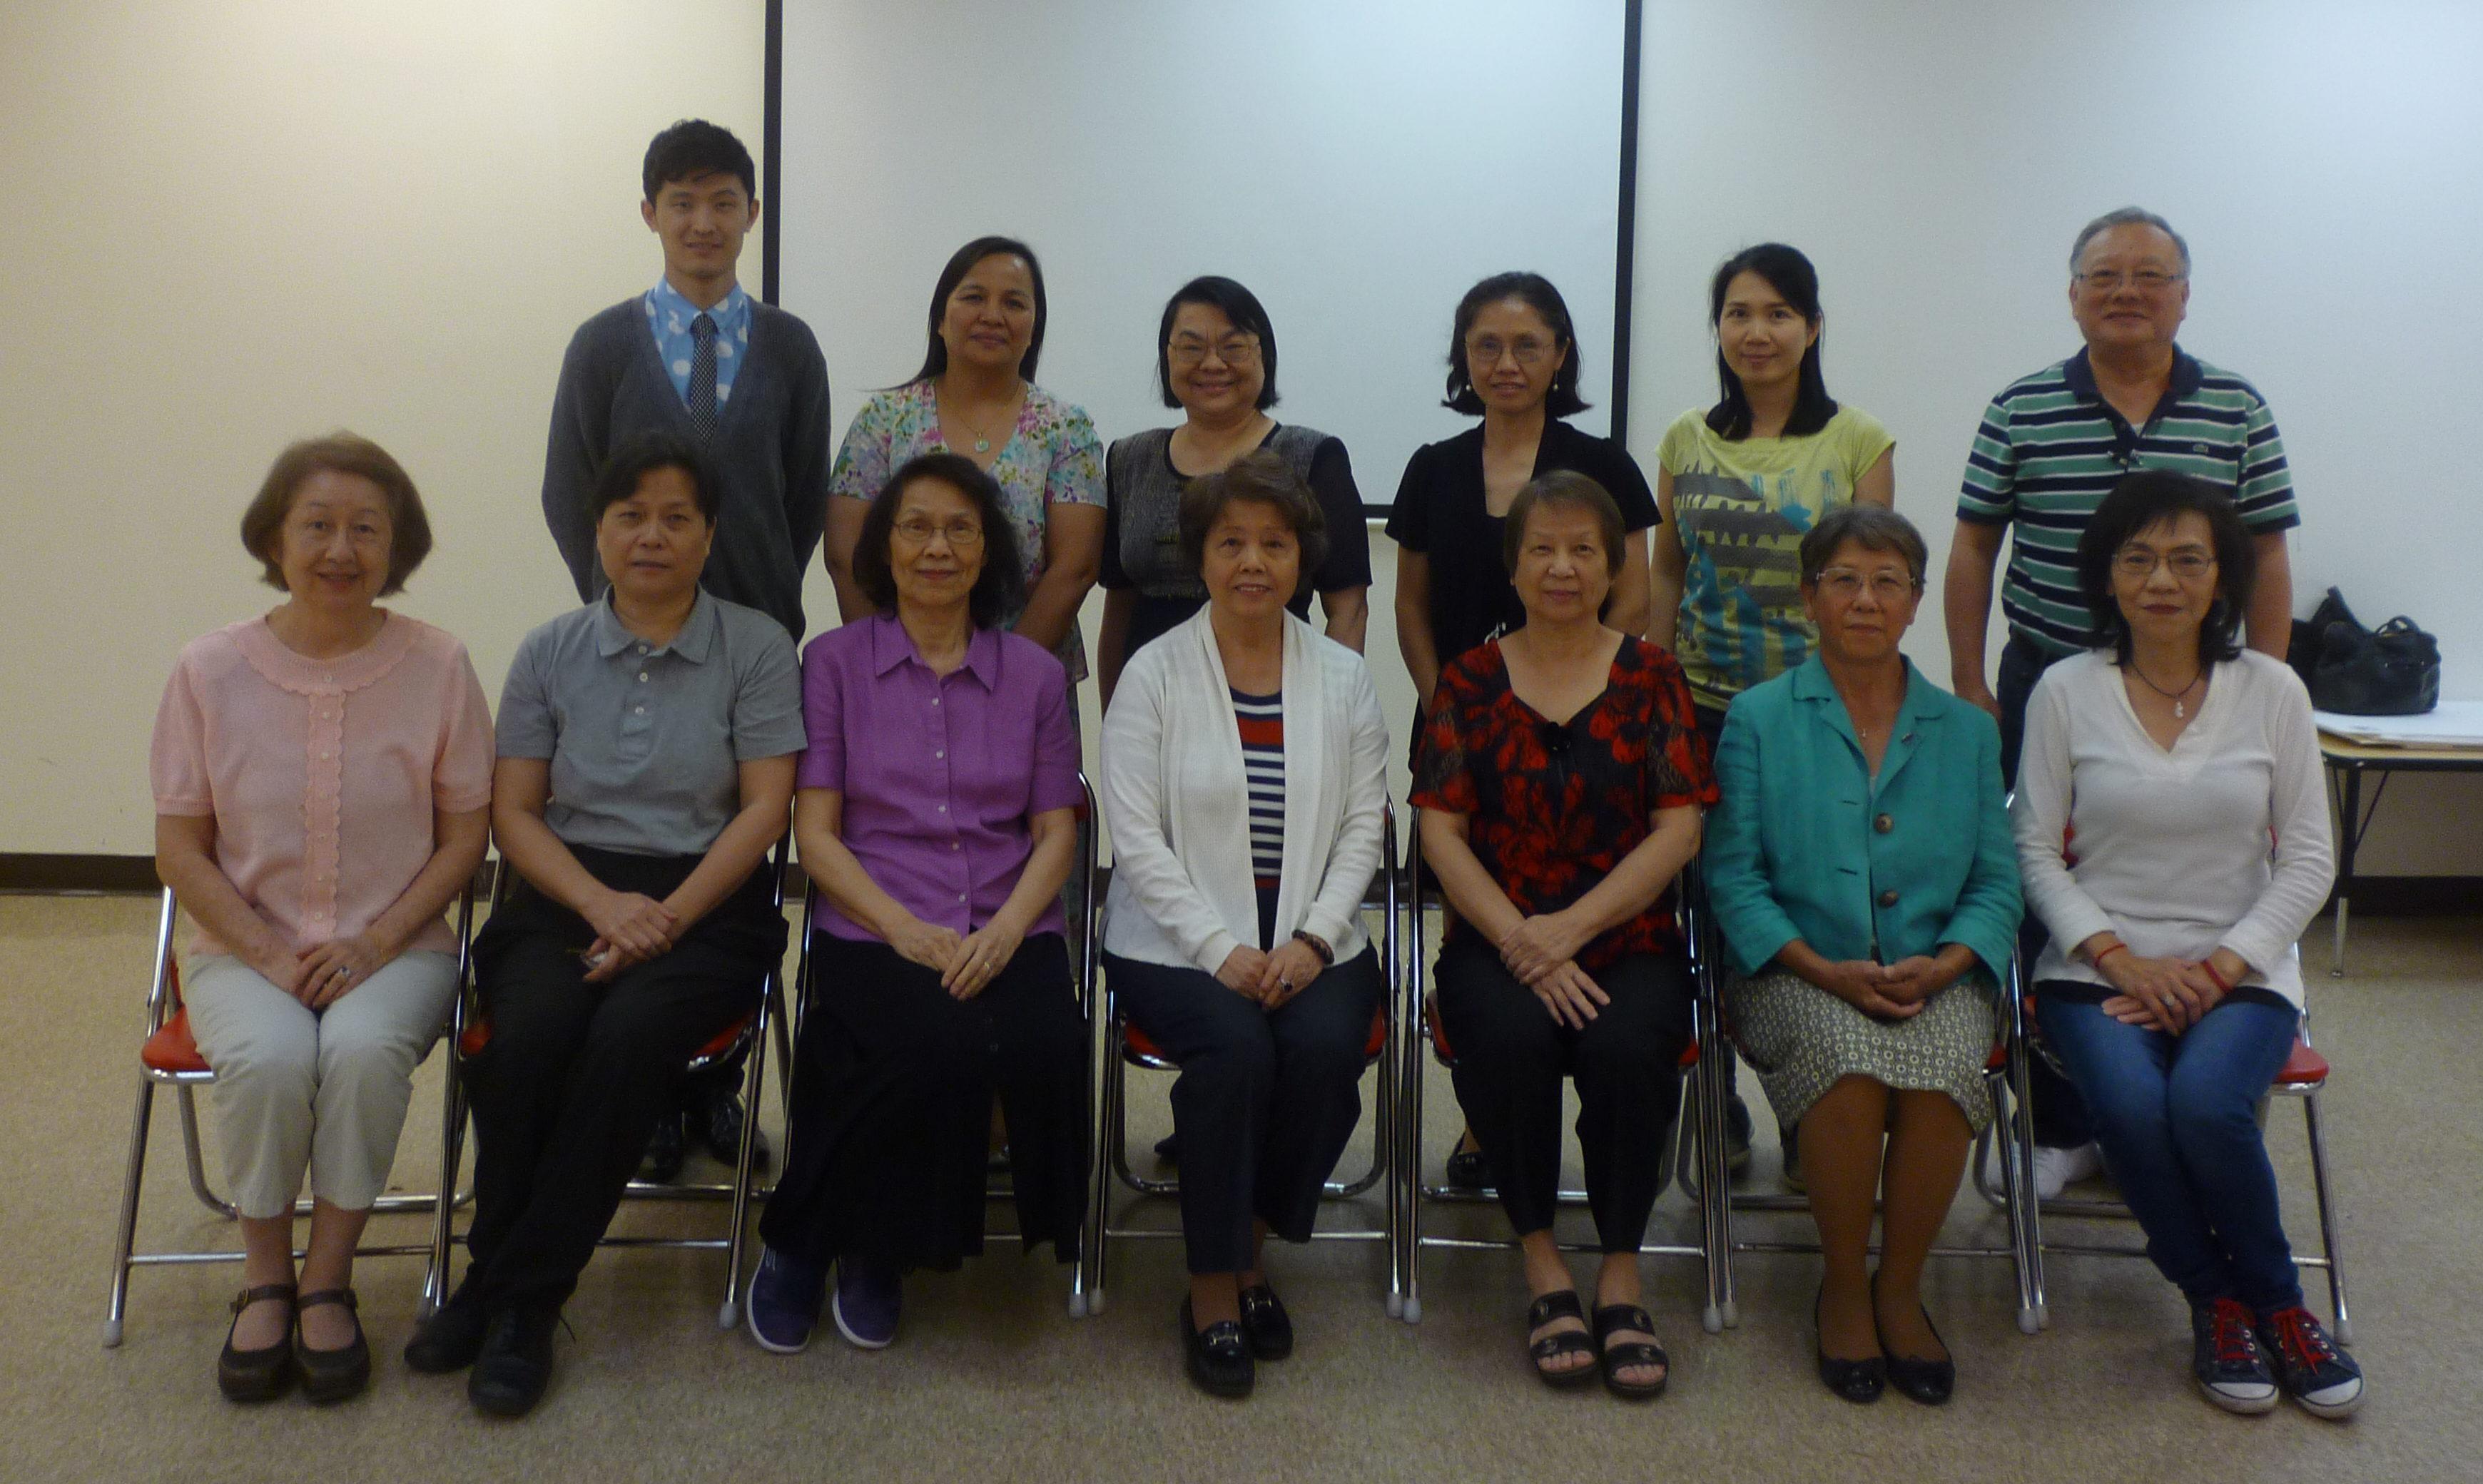 2017 Chinese school teacher group photo